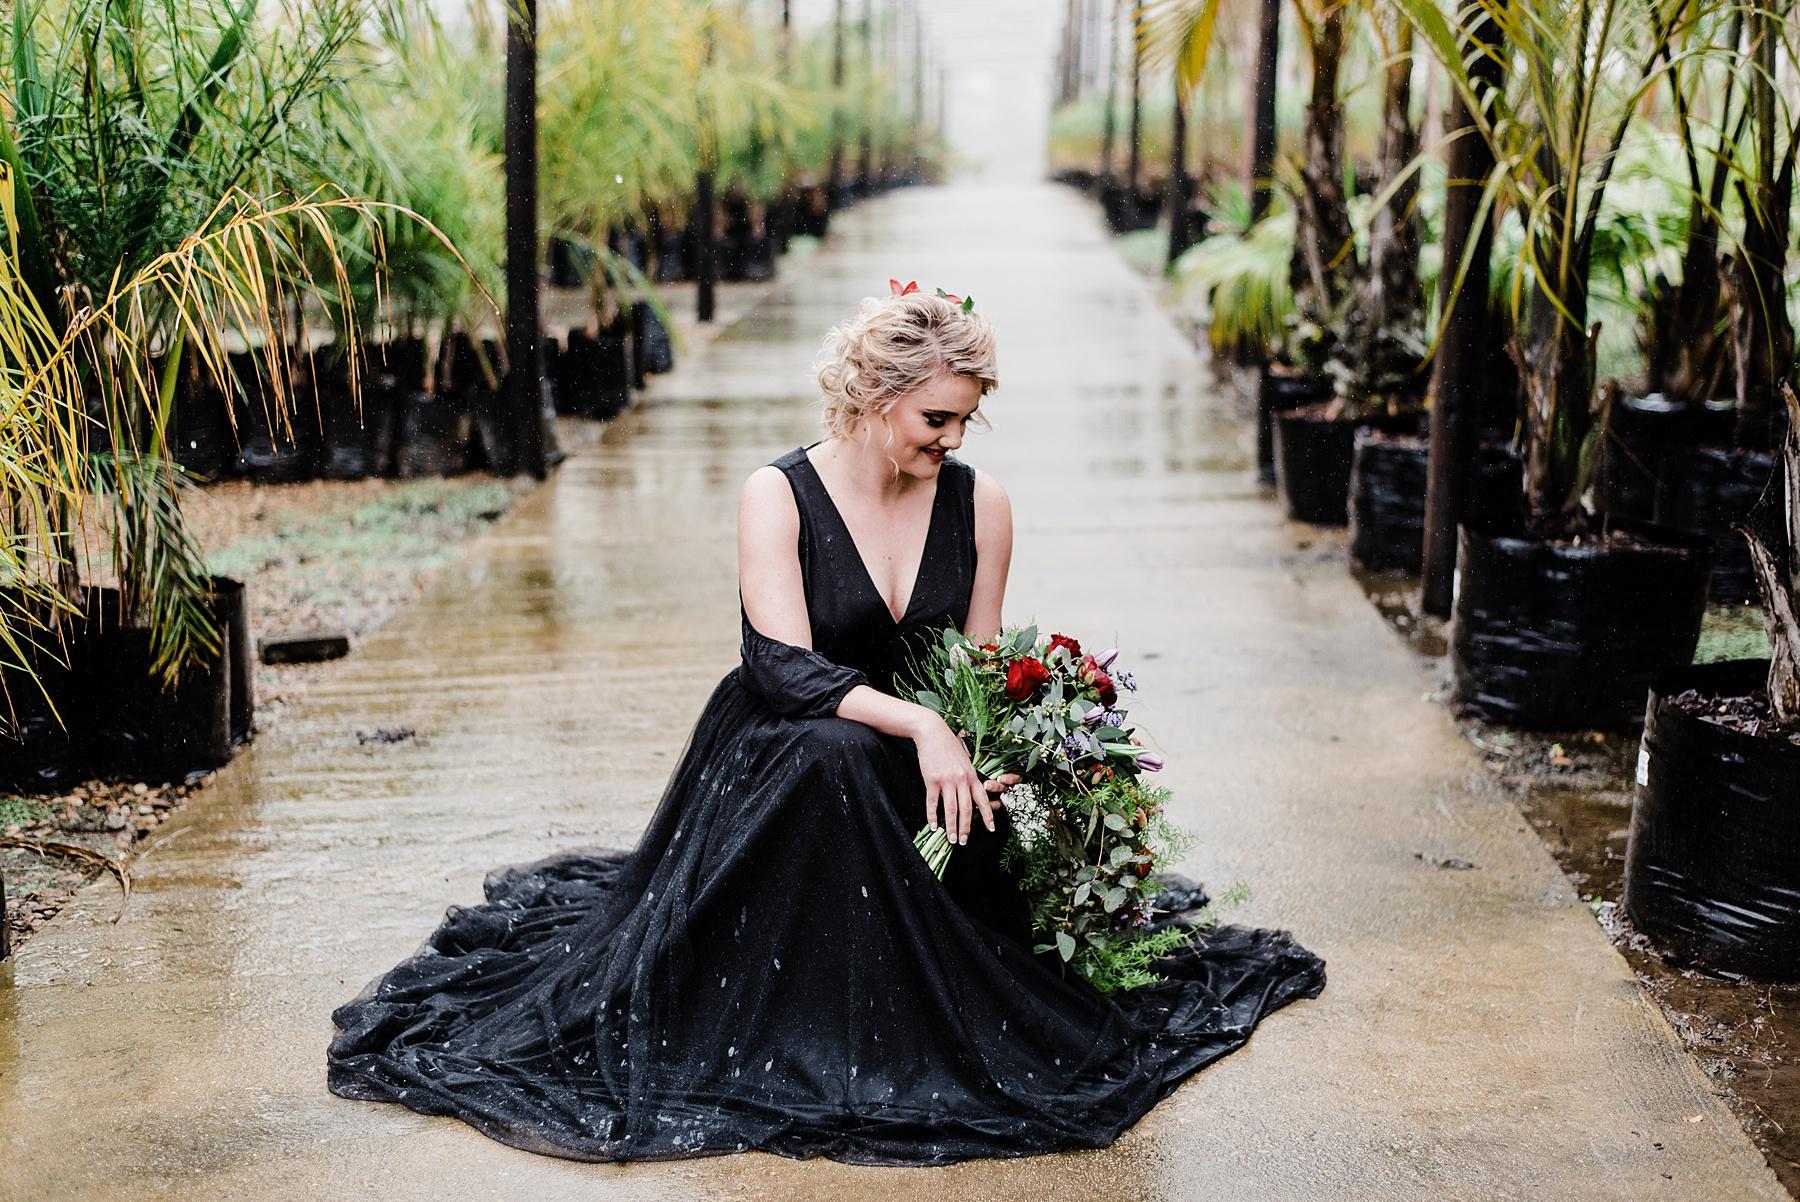 Kara D | Styled Session ft Wilna Allpass ft Rhubarb Flower Company